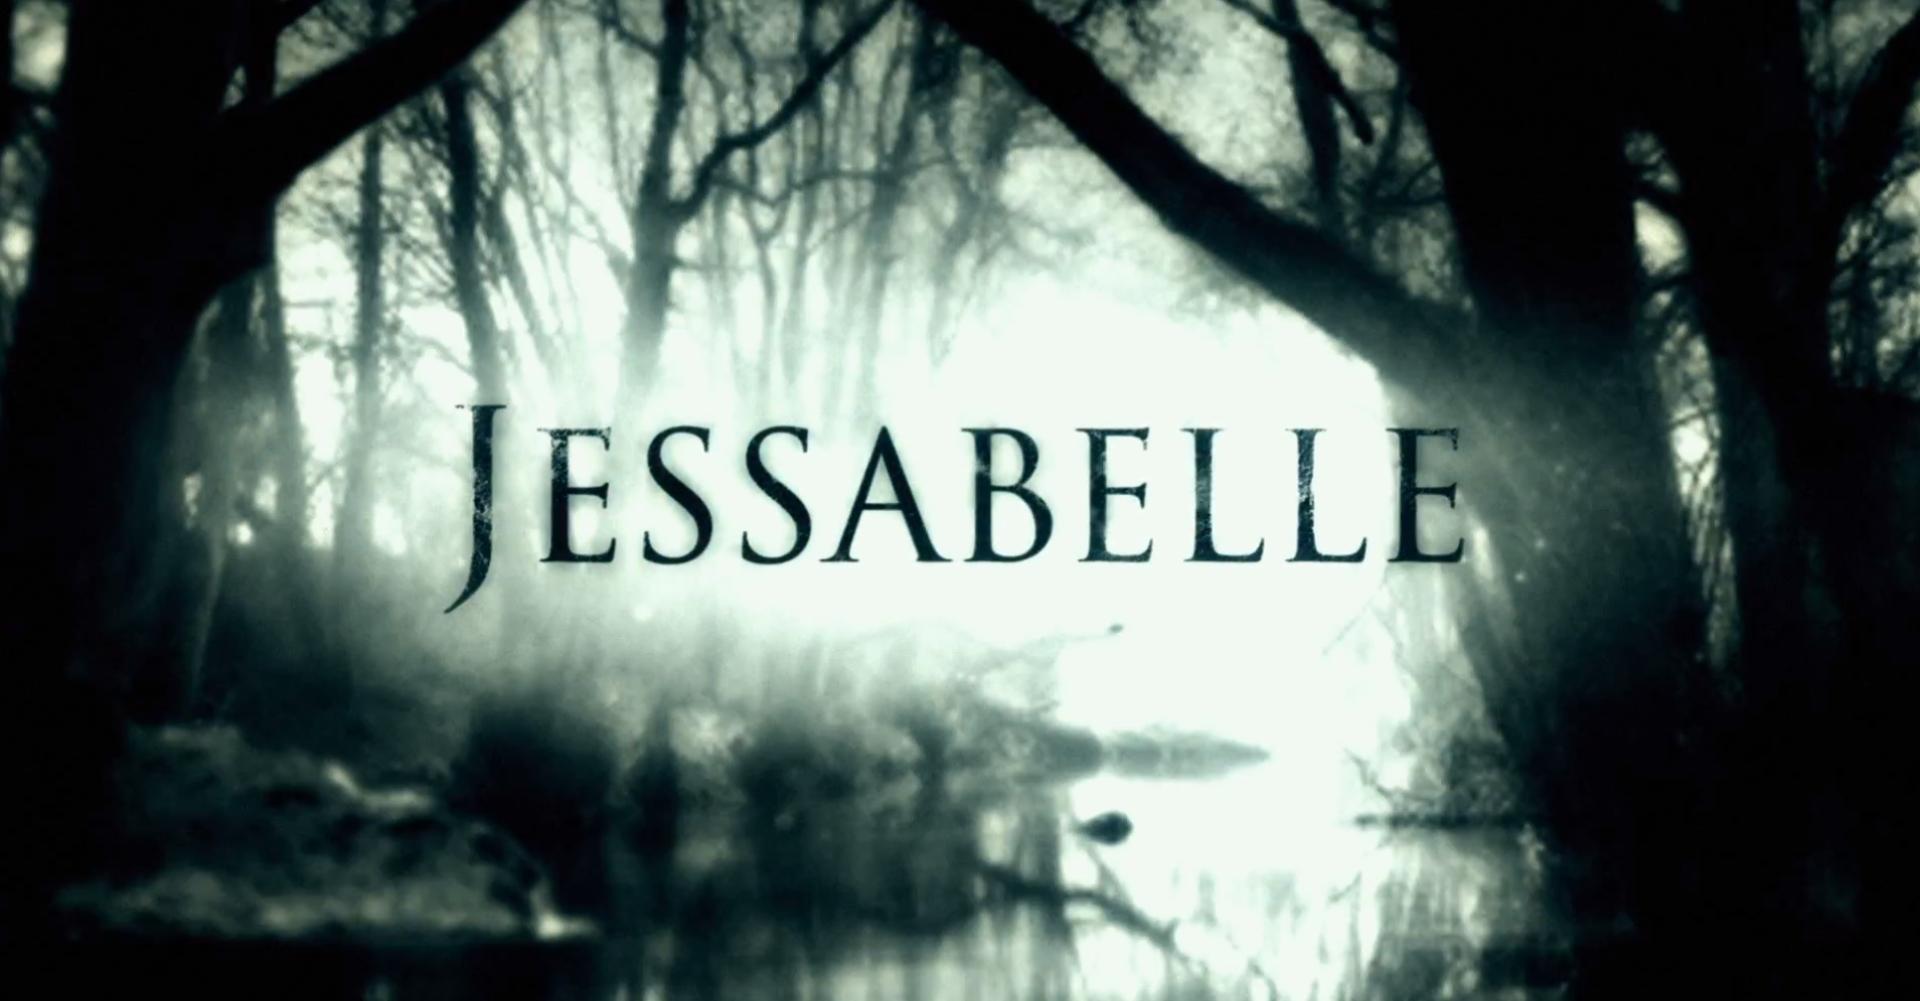 Jessabelle-trailer